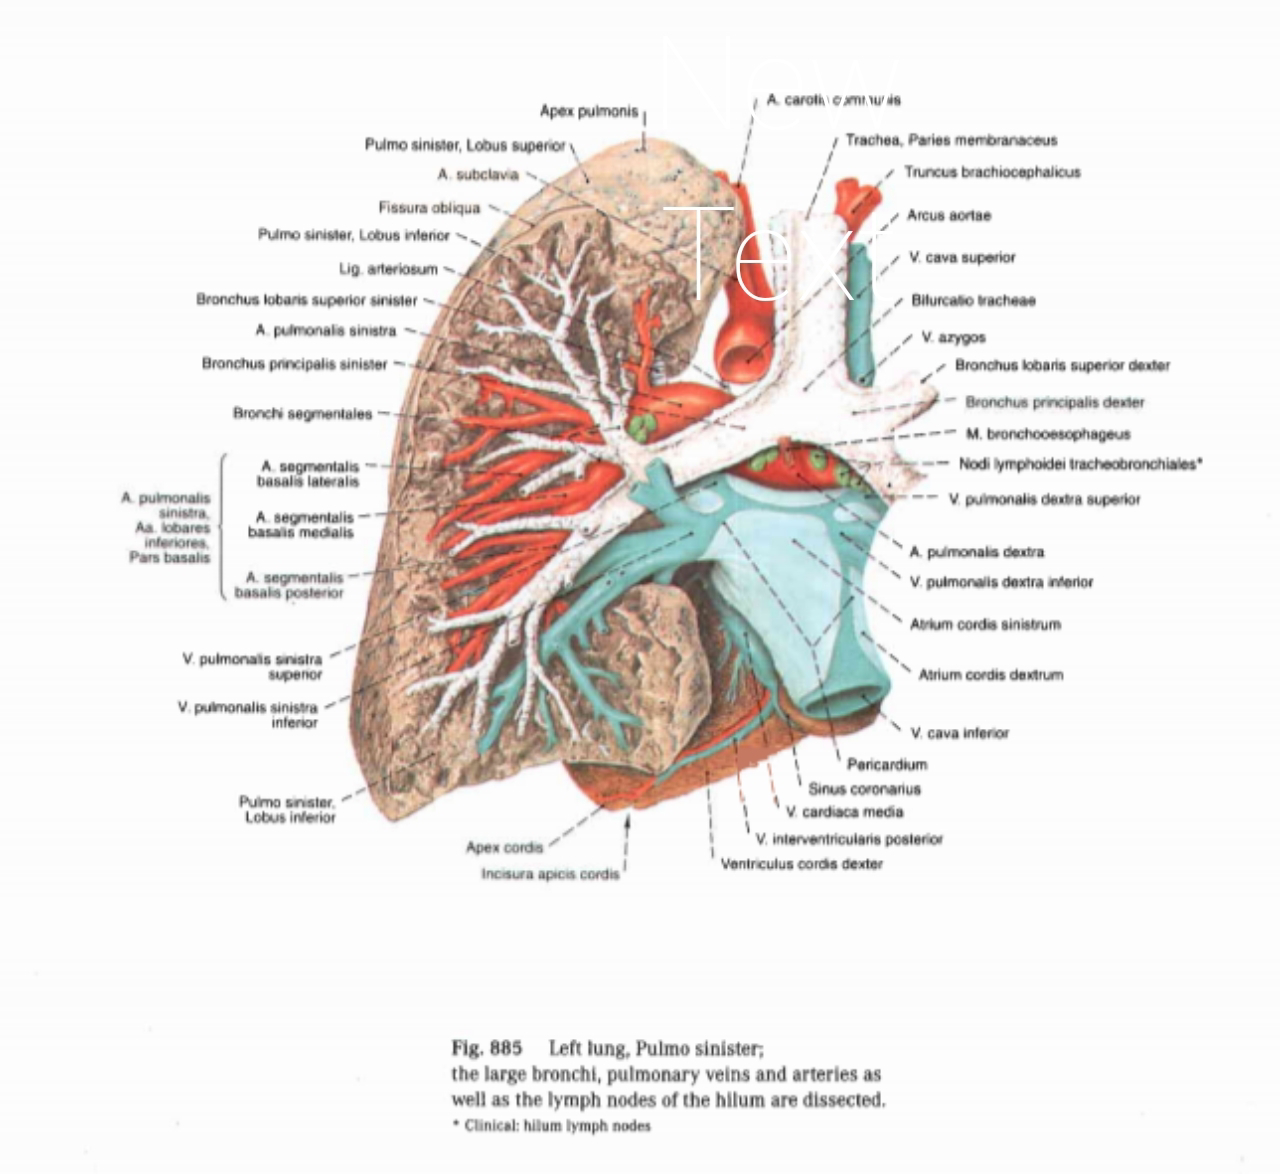 Anatomi Paru Pulmonal Pada Tubuh Manusia Sipat